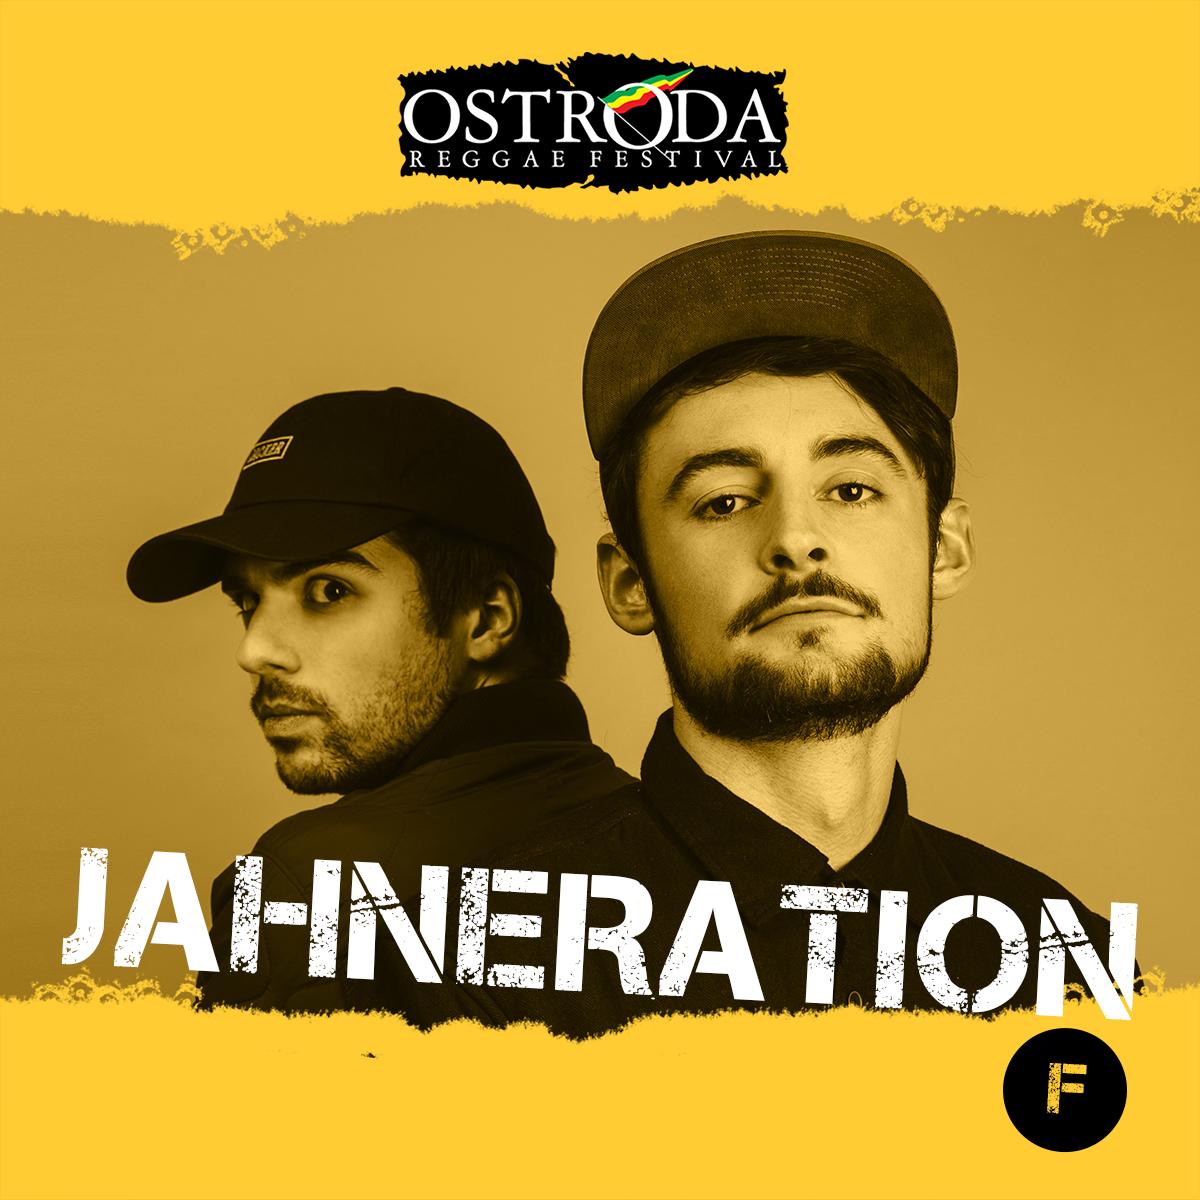 JAHNERATION (France) - Ostróda Reggae Festival 2019